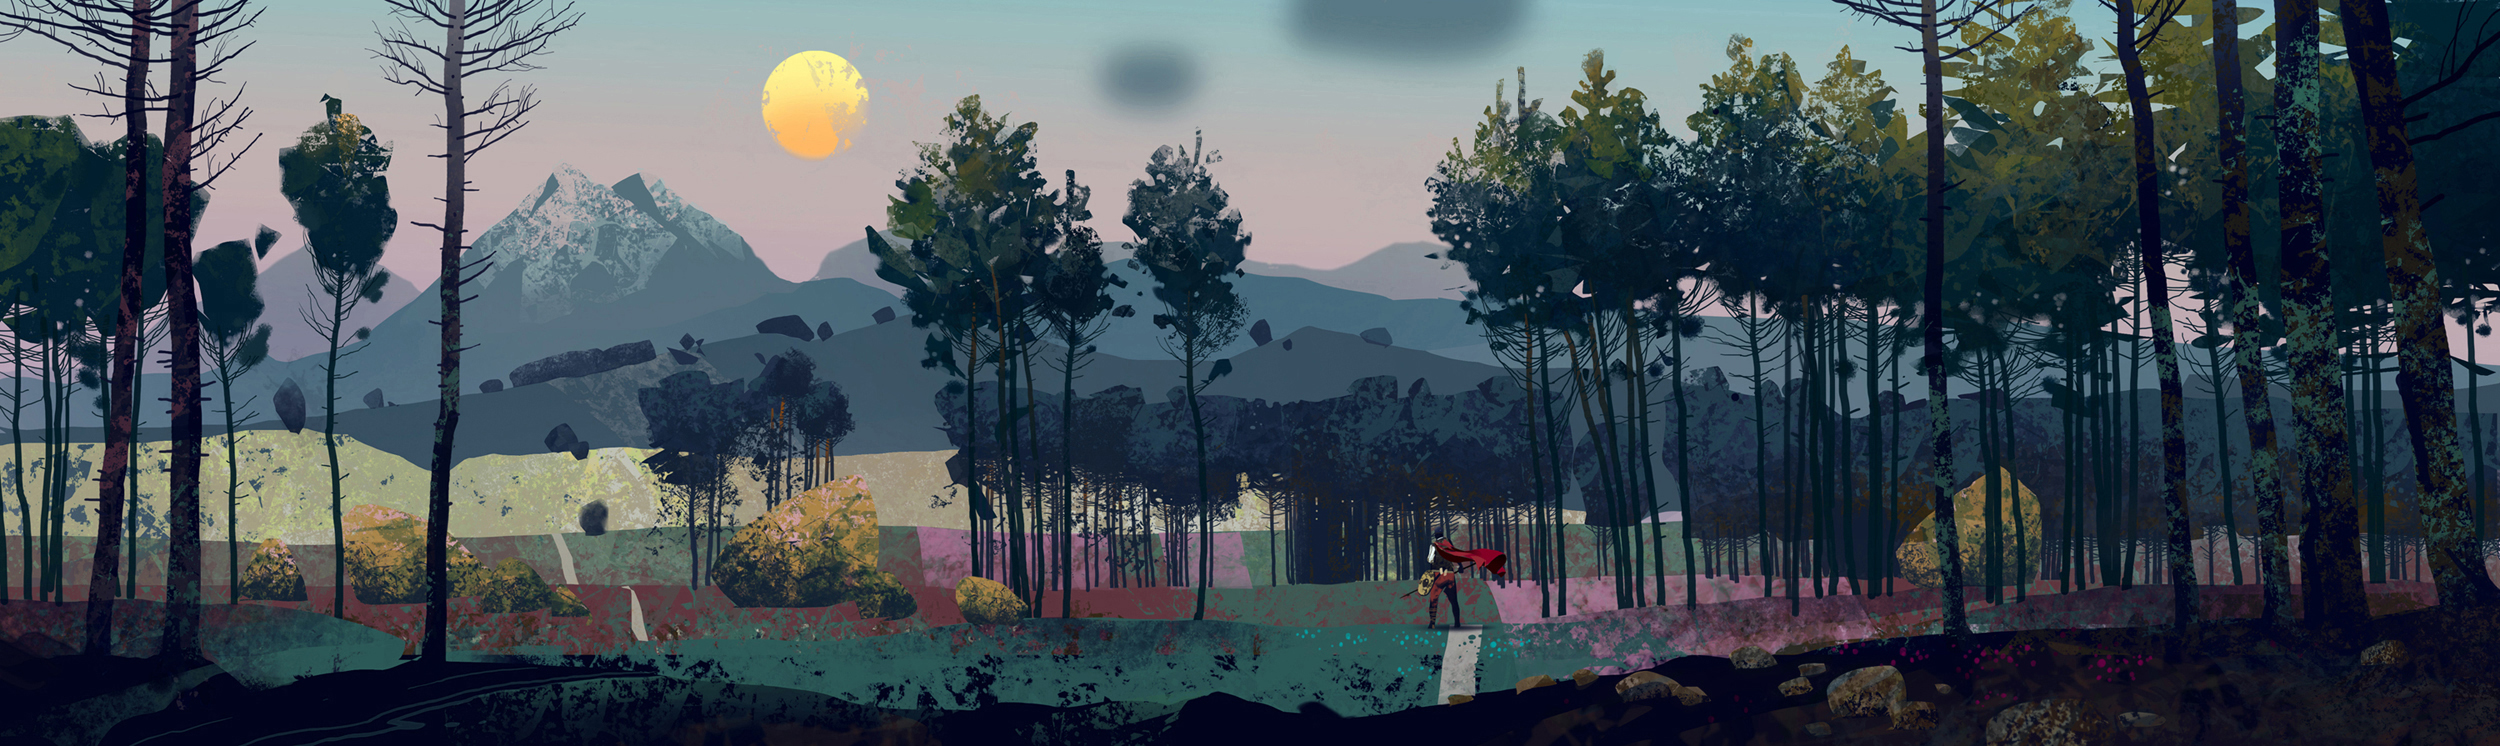 to the north by IvanLaliashvili